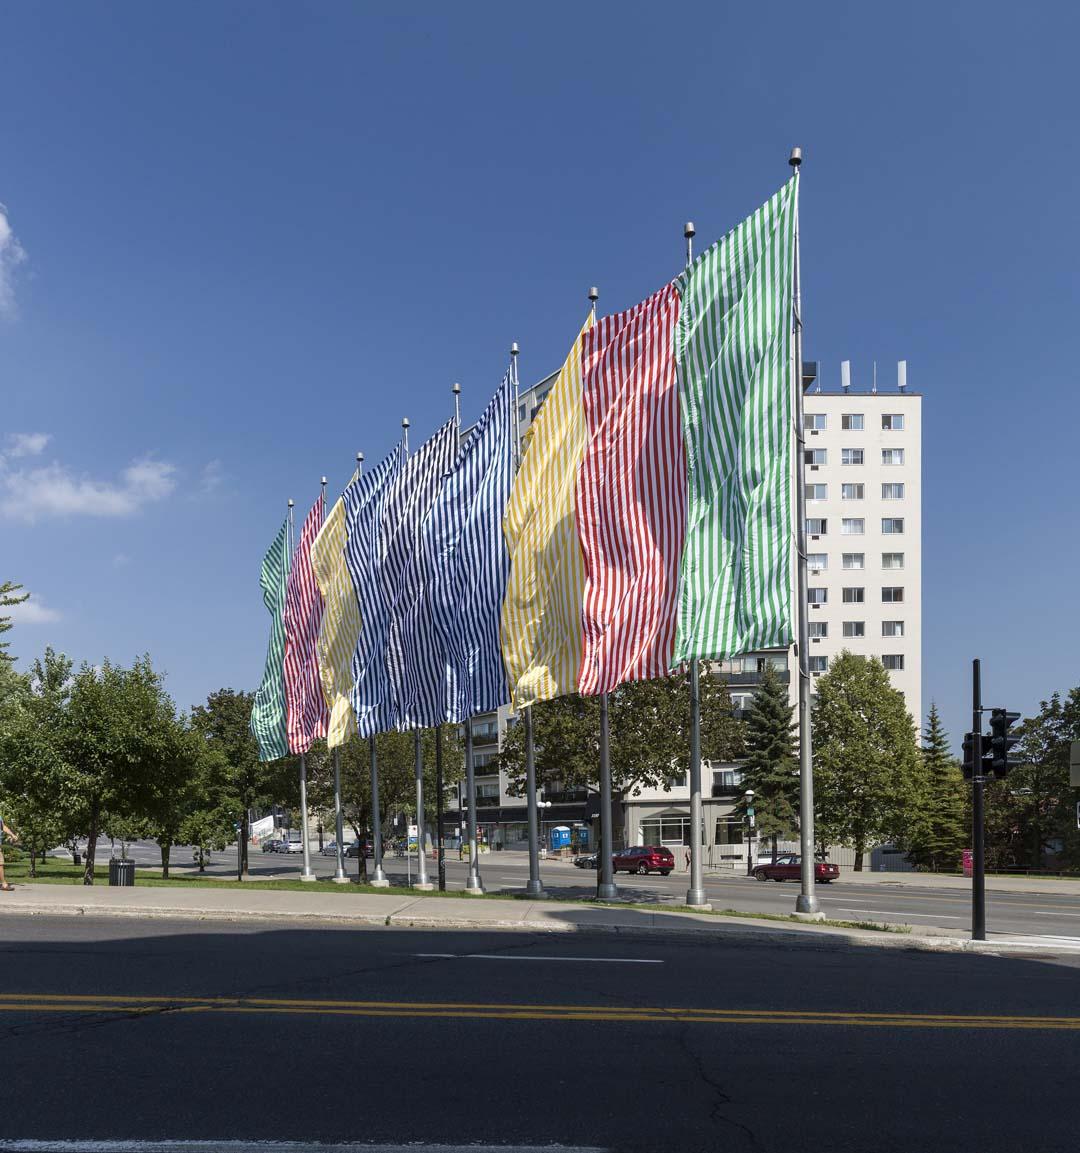 Neuf couleurs au vent, Daniel Buren